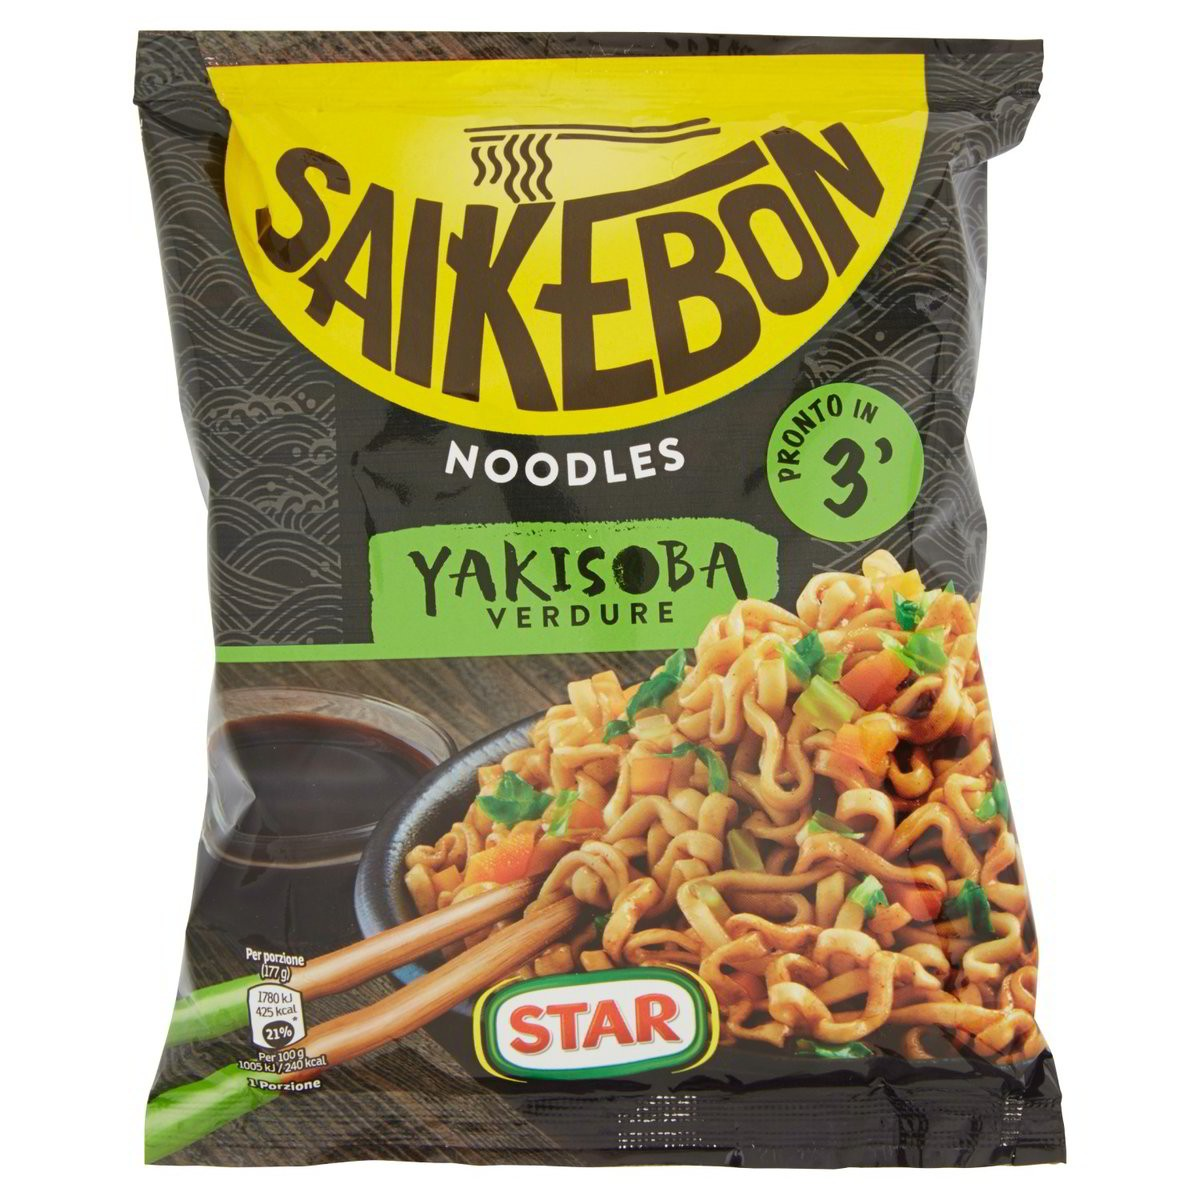 Star Saikebon Yakisoba